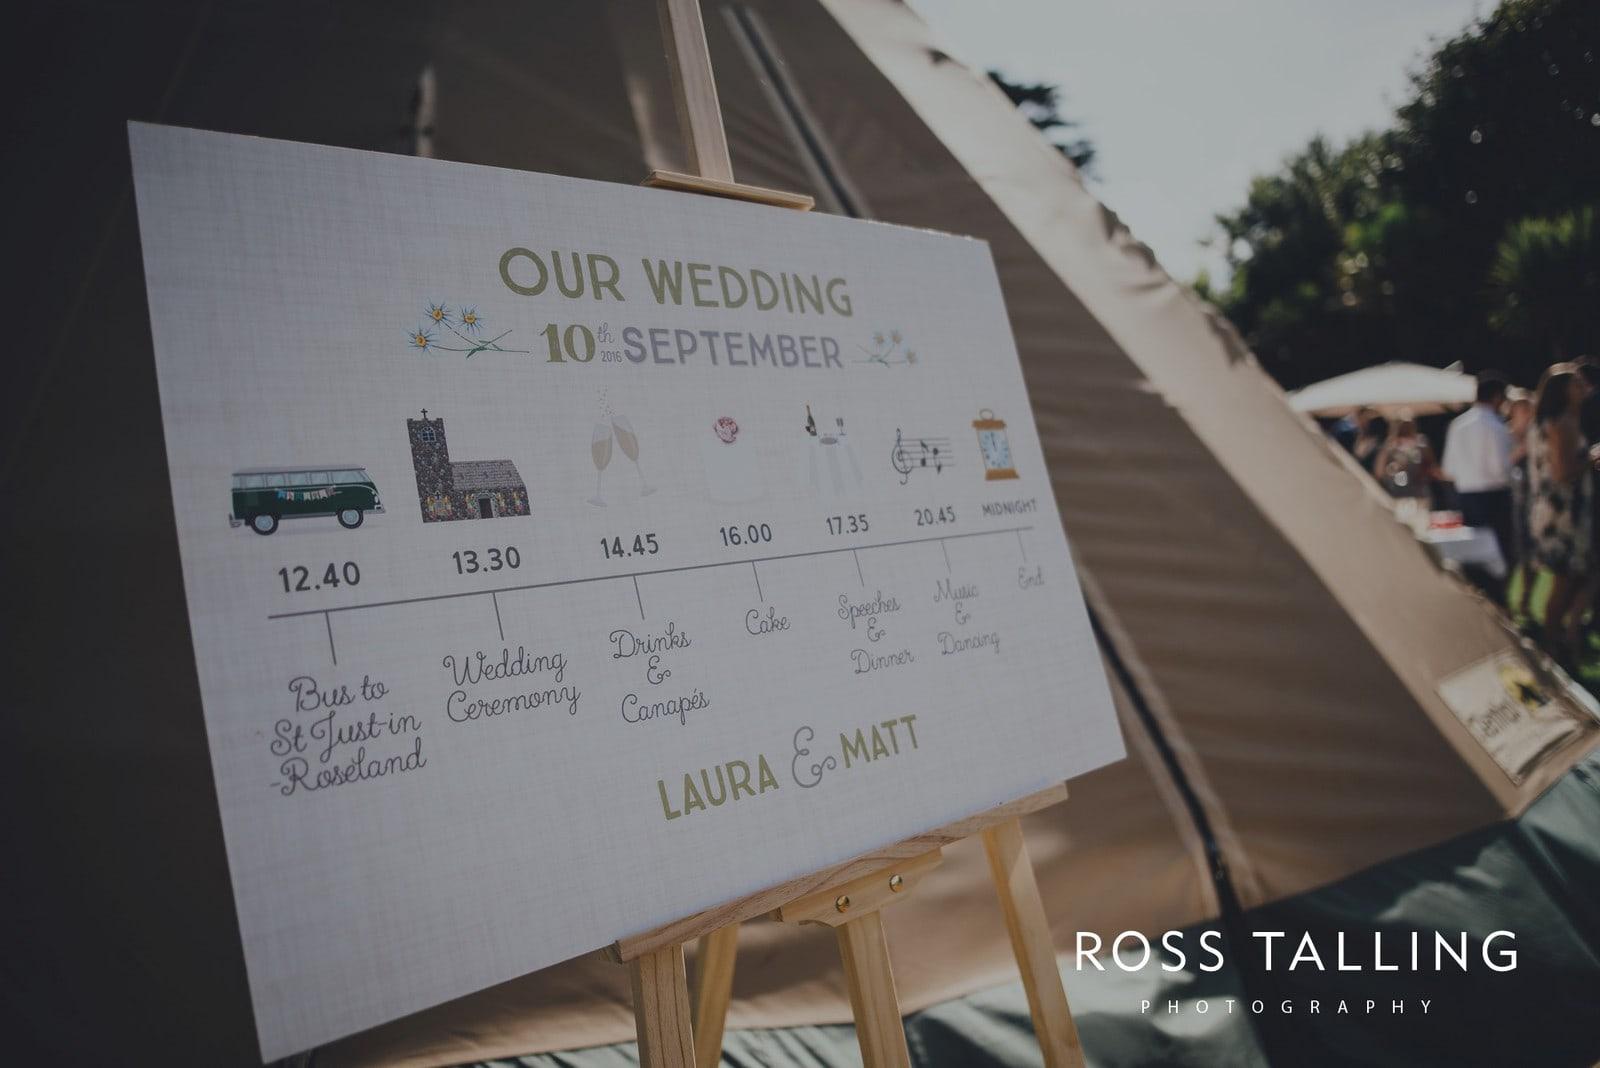 laura-matts-rosevine-hotel-wedding-photography-cornwall_0105